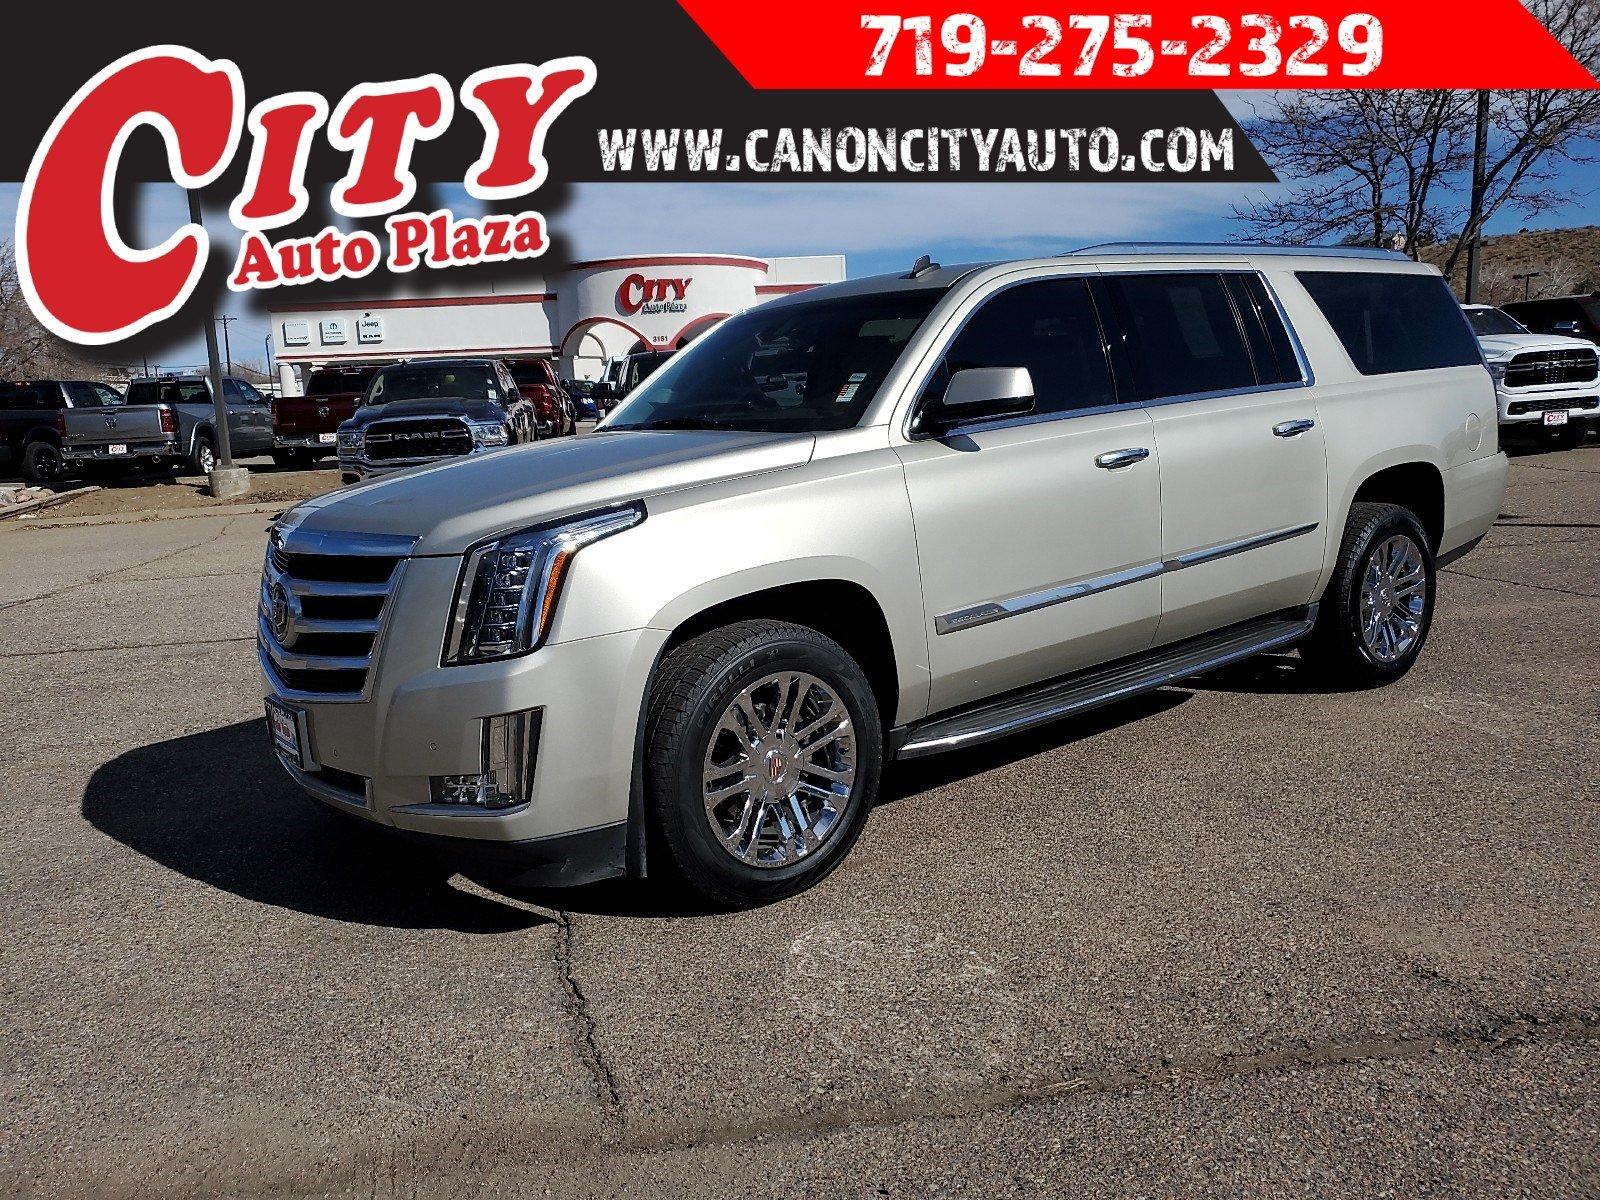 Used 2015 Cadillac Escalade ESV Standard 4WD  Standard Canon City, CO